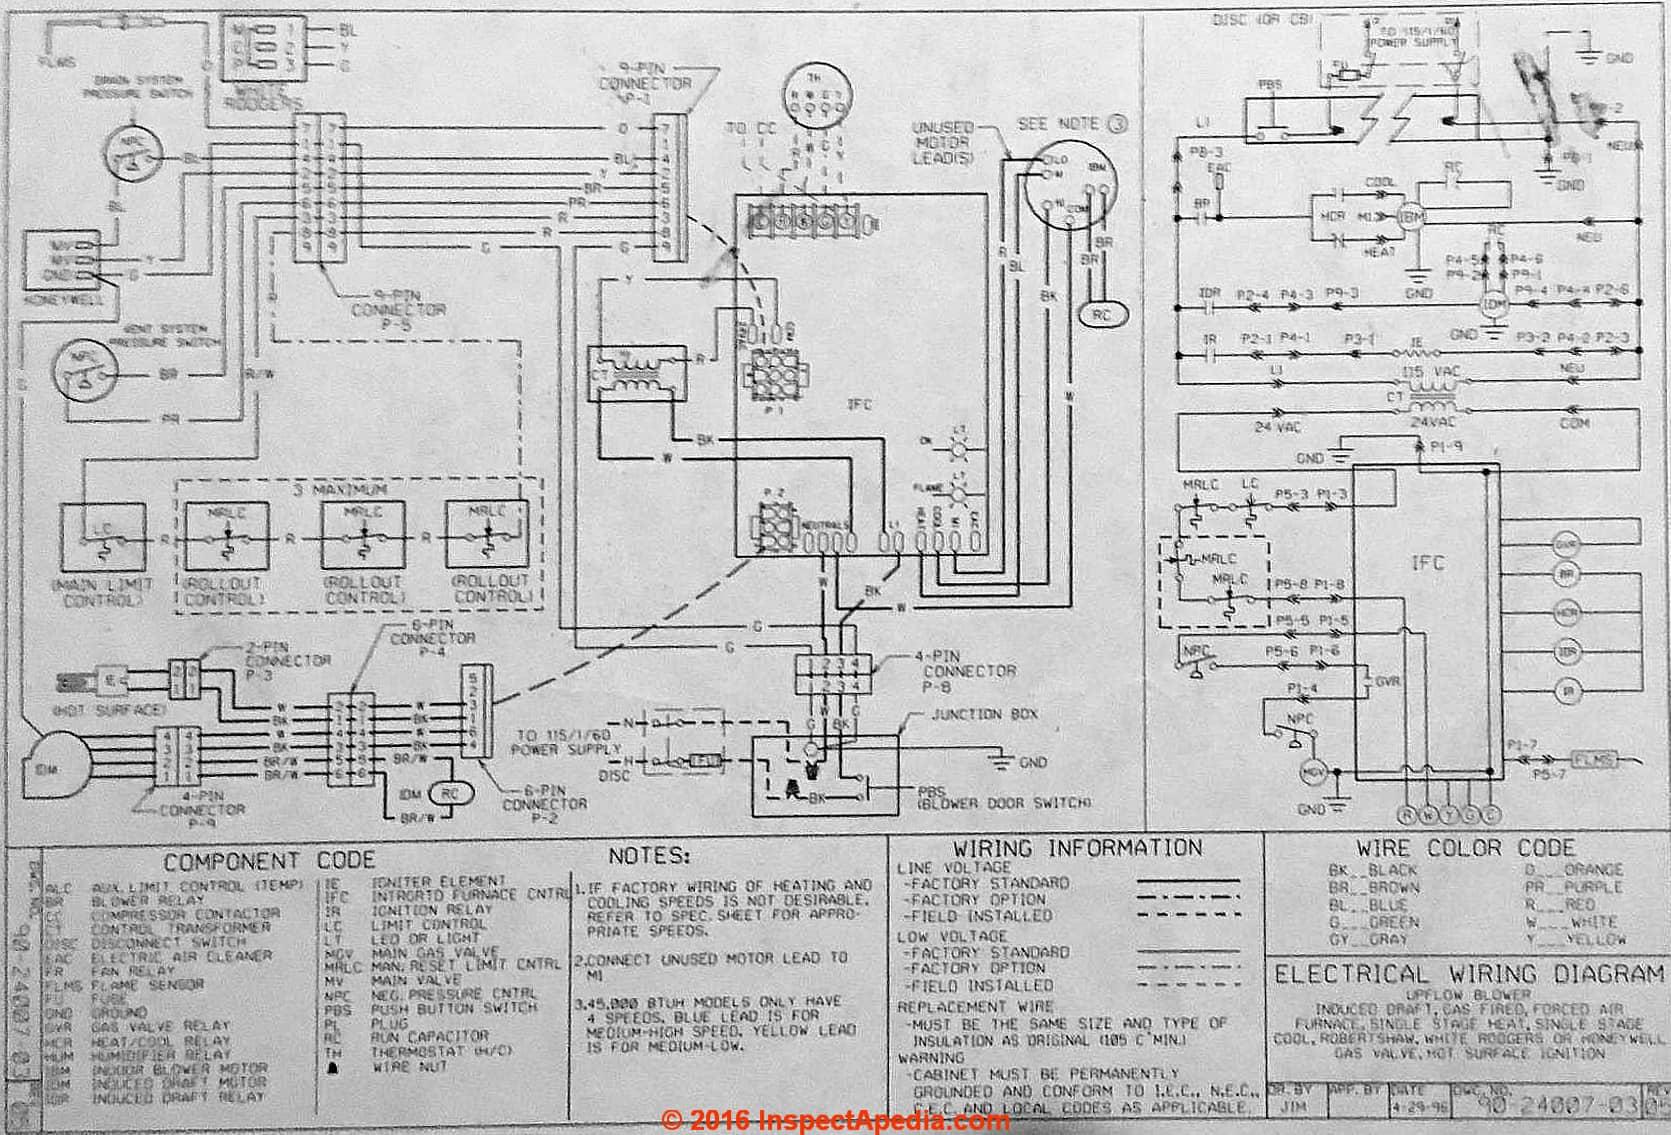 HO_1894] Comfortmaker Heat Pump Wiring Diagram Schematic WiringAnist Icand Sospe Xrenket Estep Mopar Lectu Stap Scata Kapemie  Mohammedshrine Librar Wiring 101